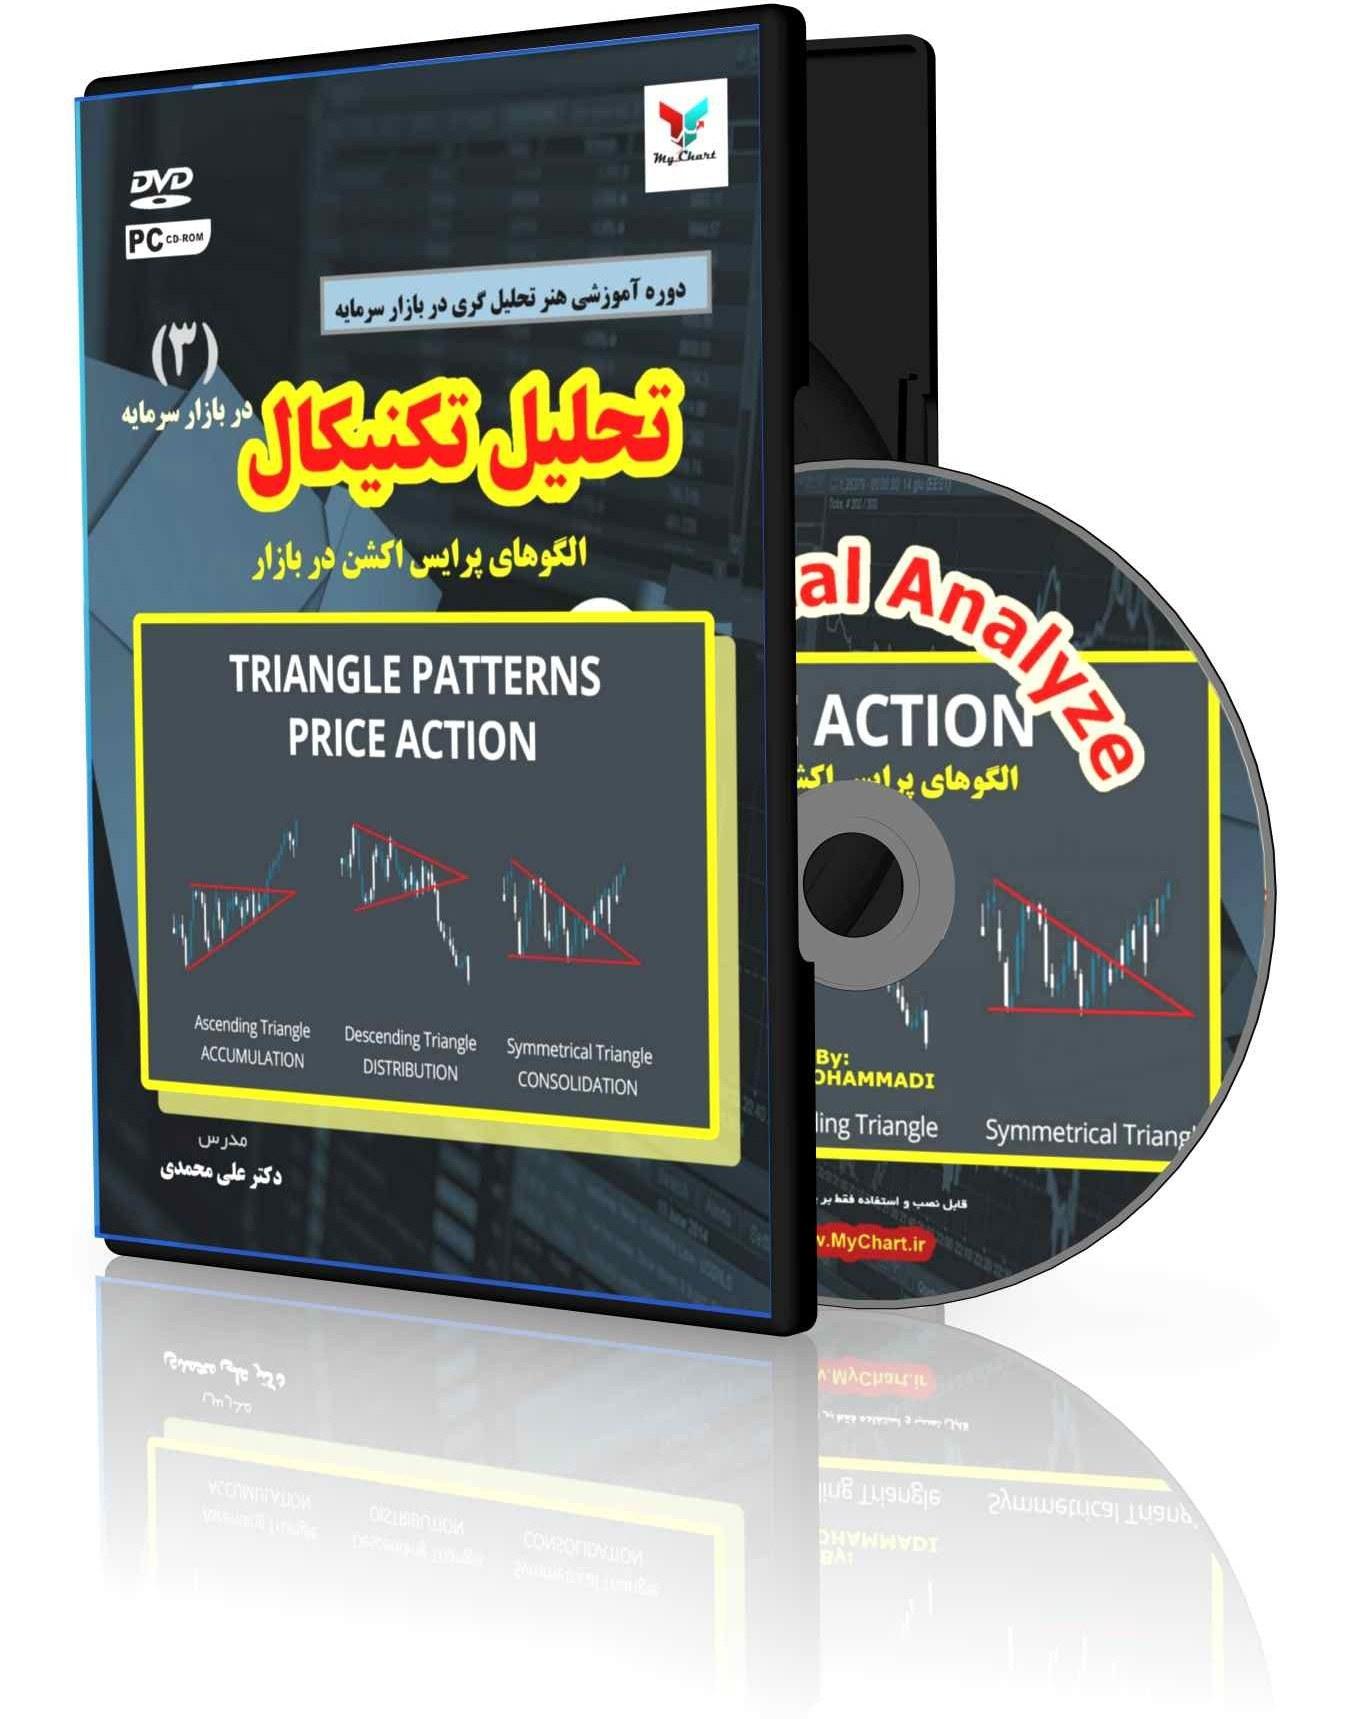 image پکیج تحلیل تکنیکال (3): الگوهای پرایس اکشن در بازار